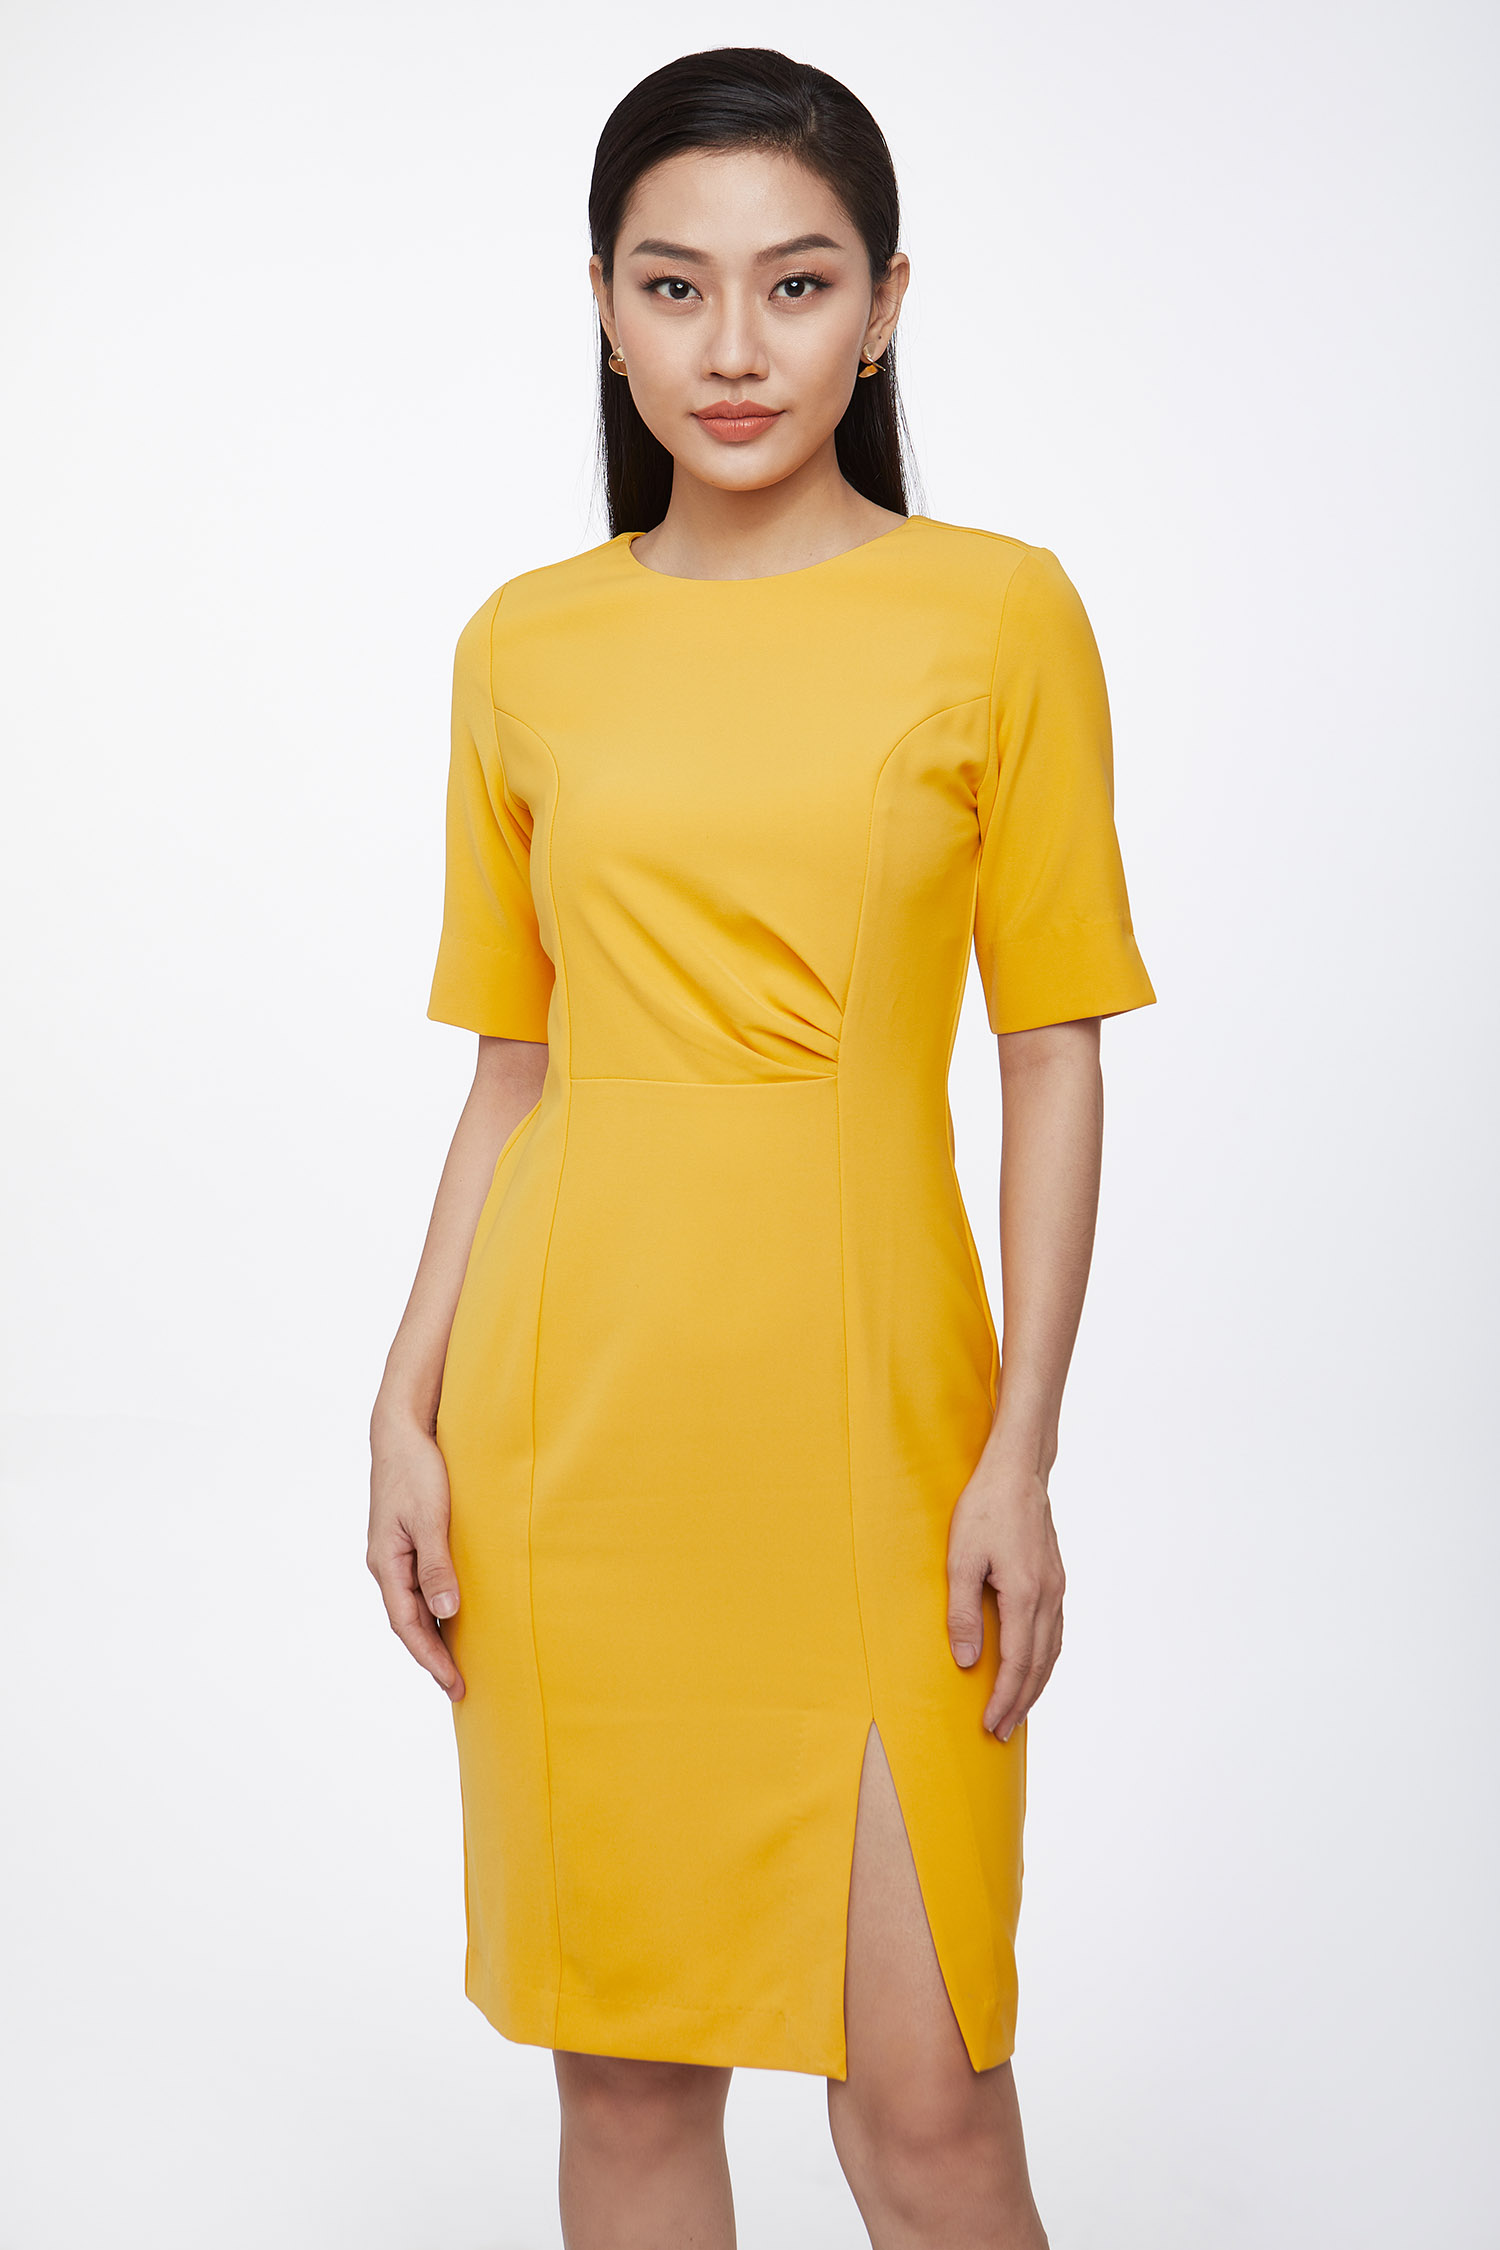 Đầm nữ - 1905110